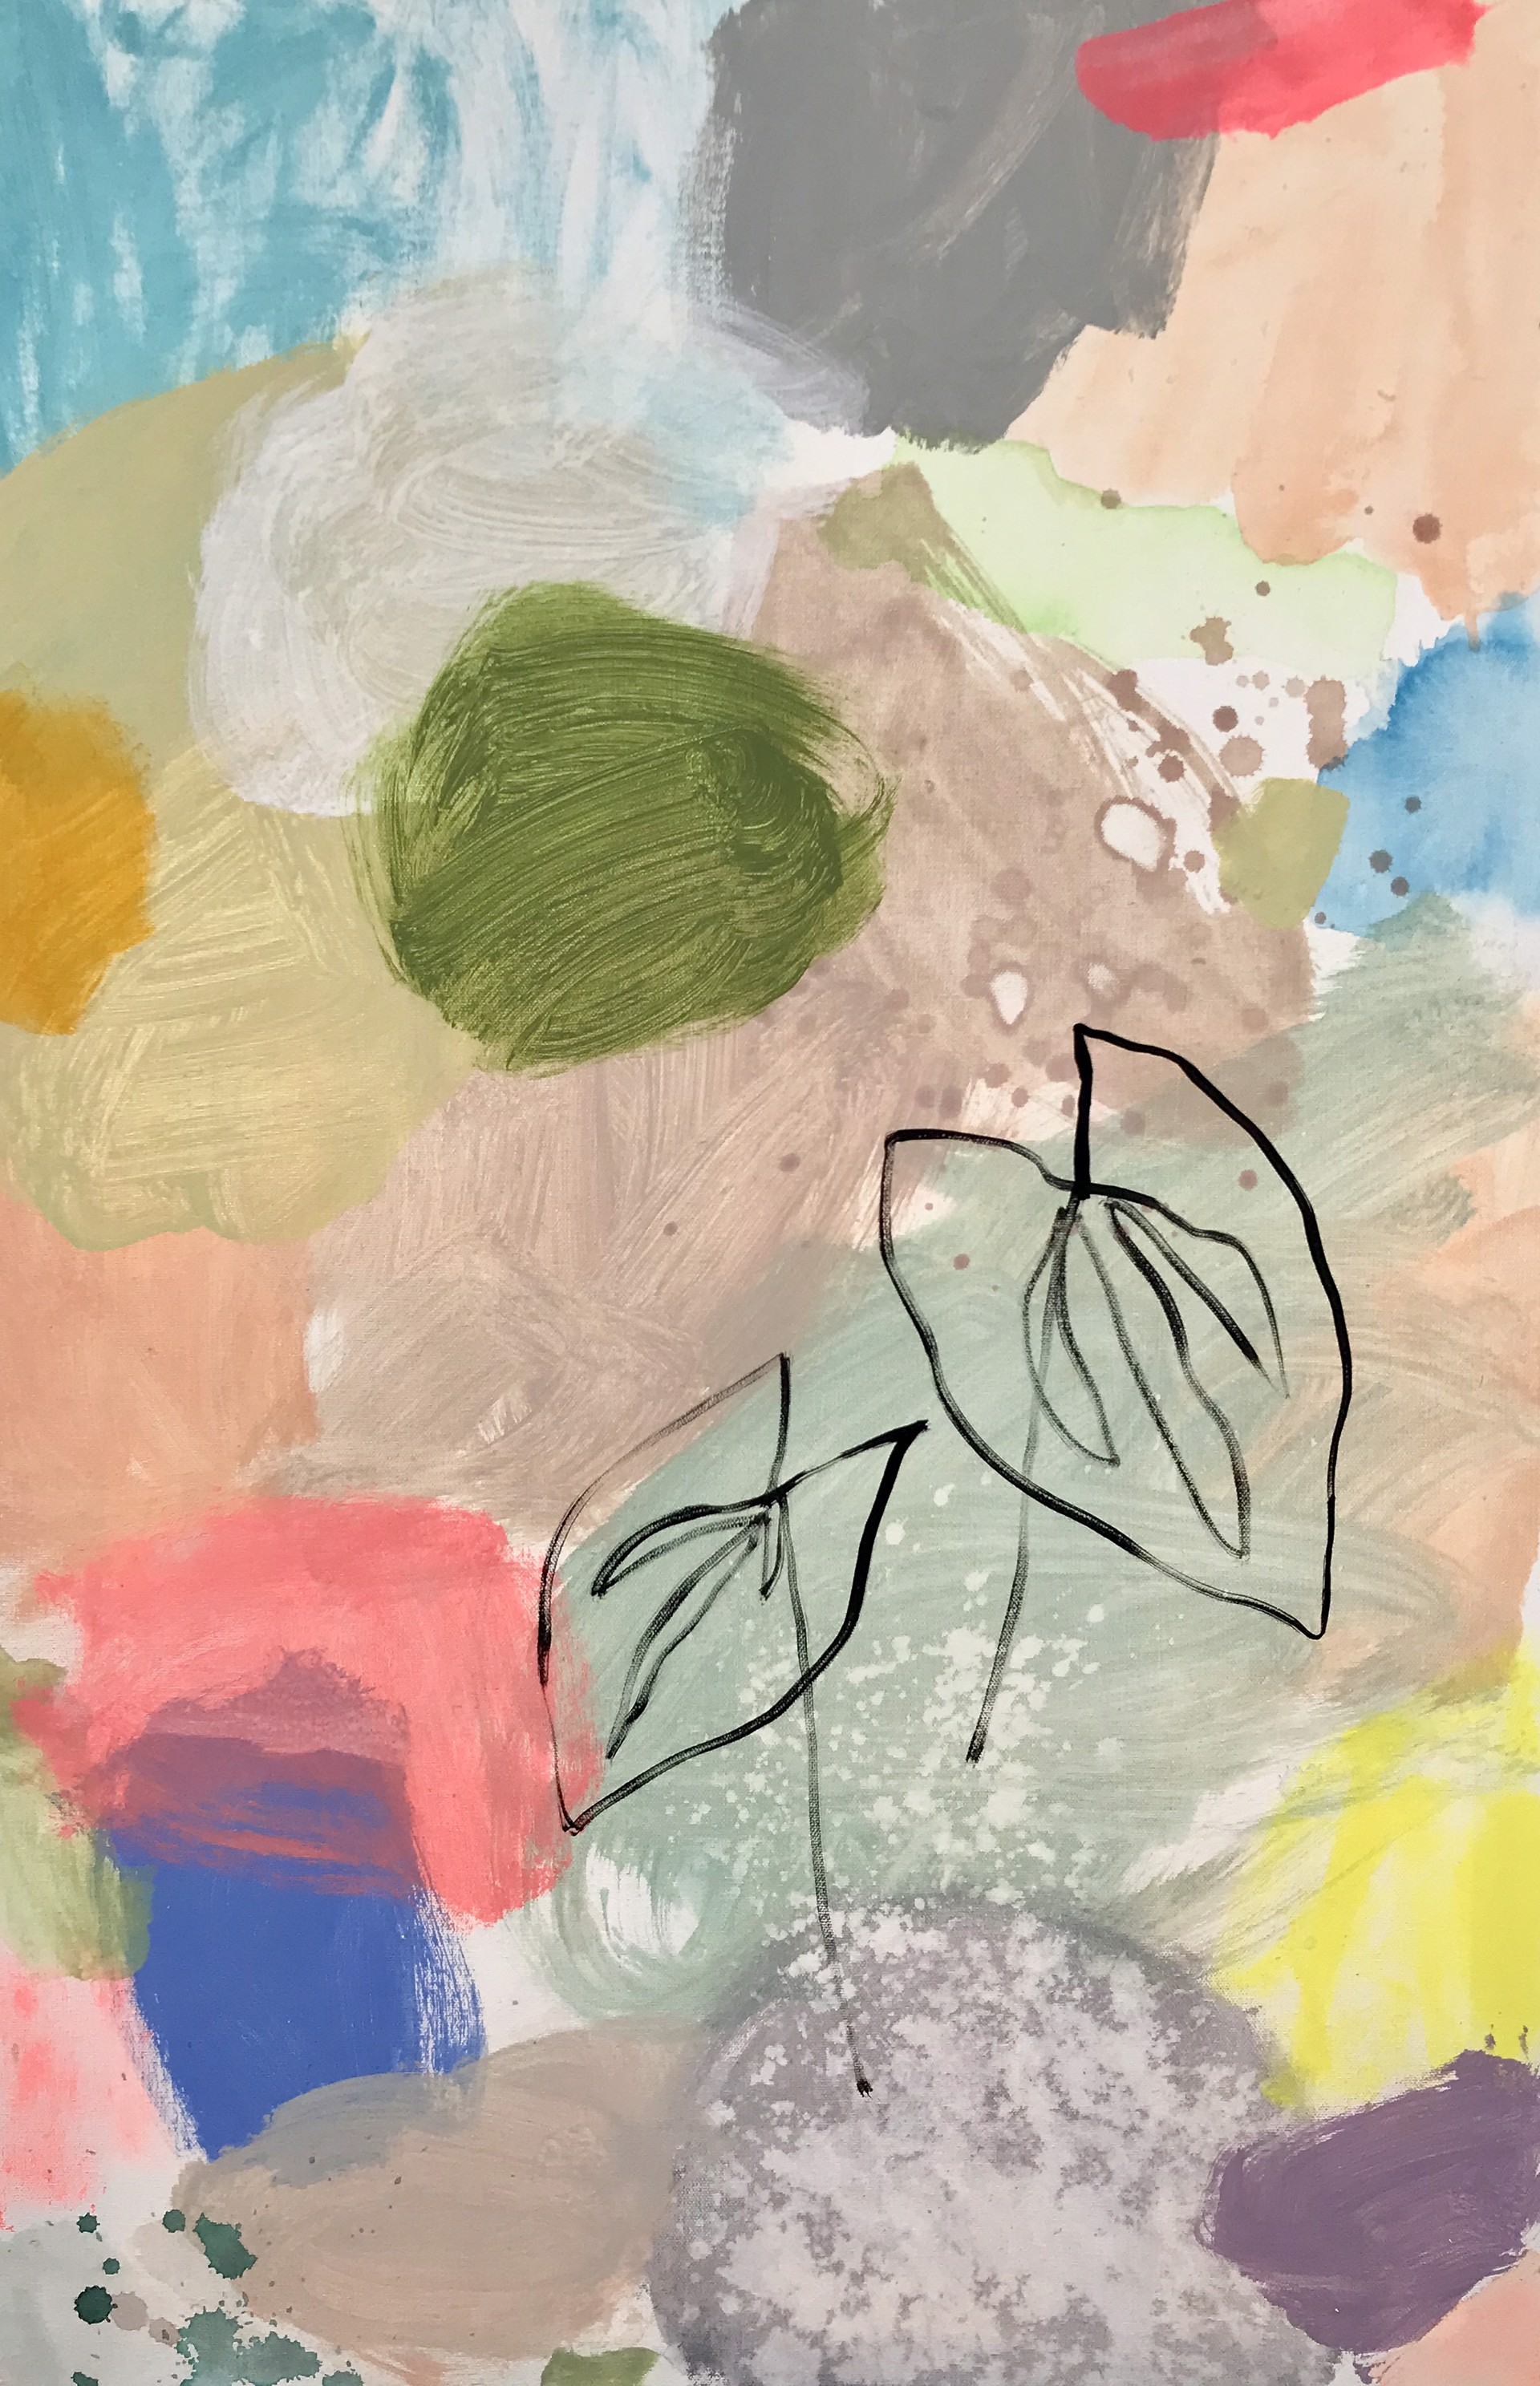 Untitled II by Suzy Lindow